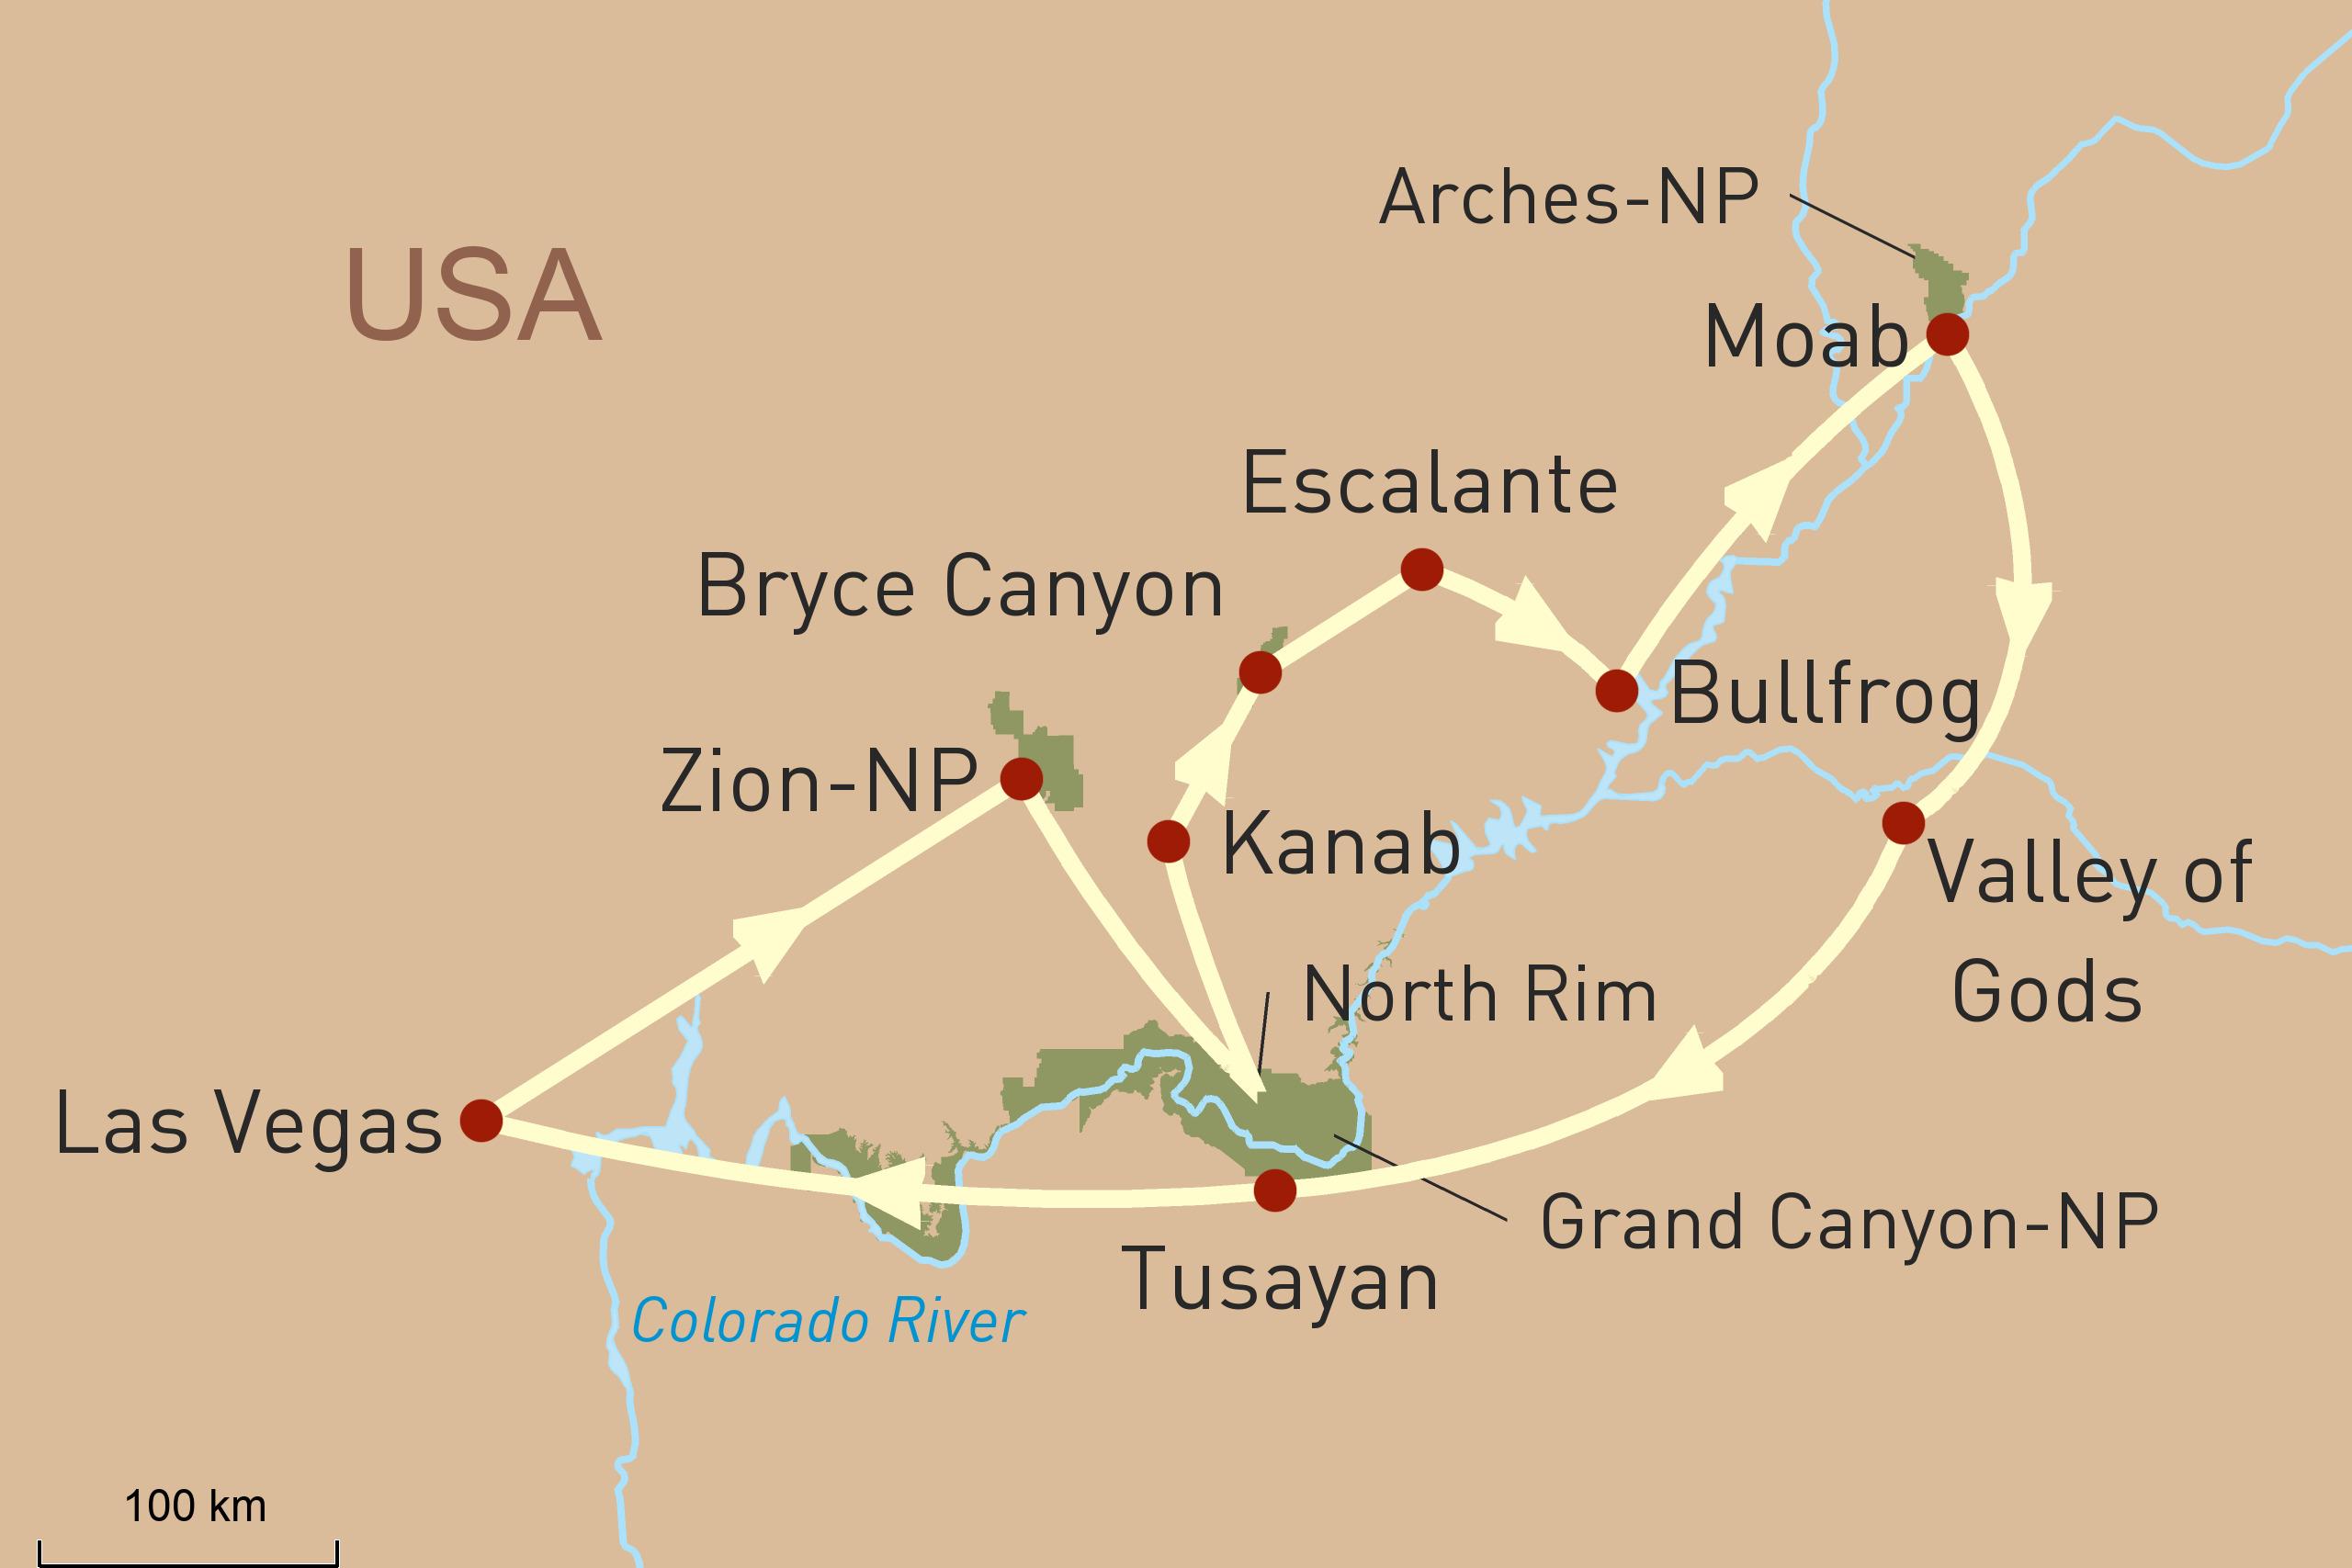 Privatrundreise zu den Canyons der USA